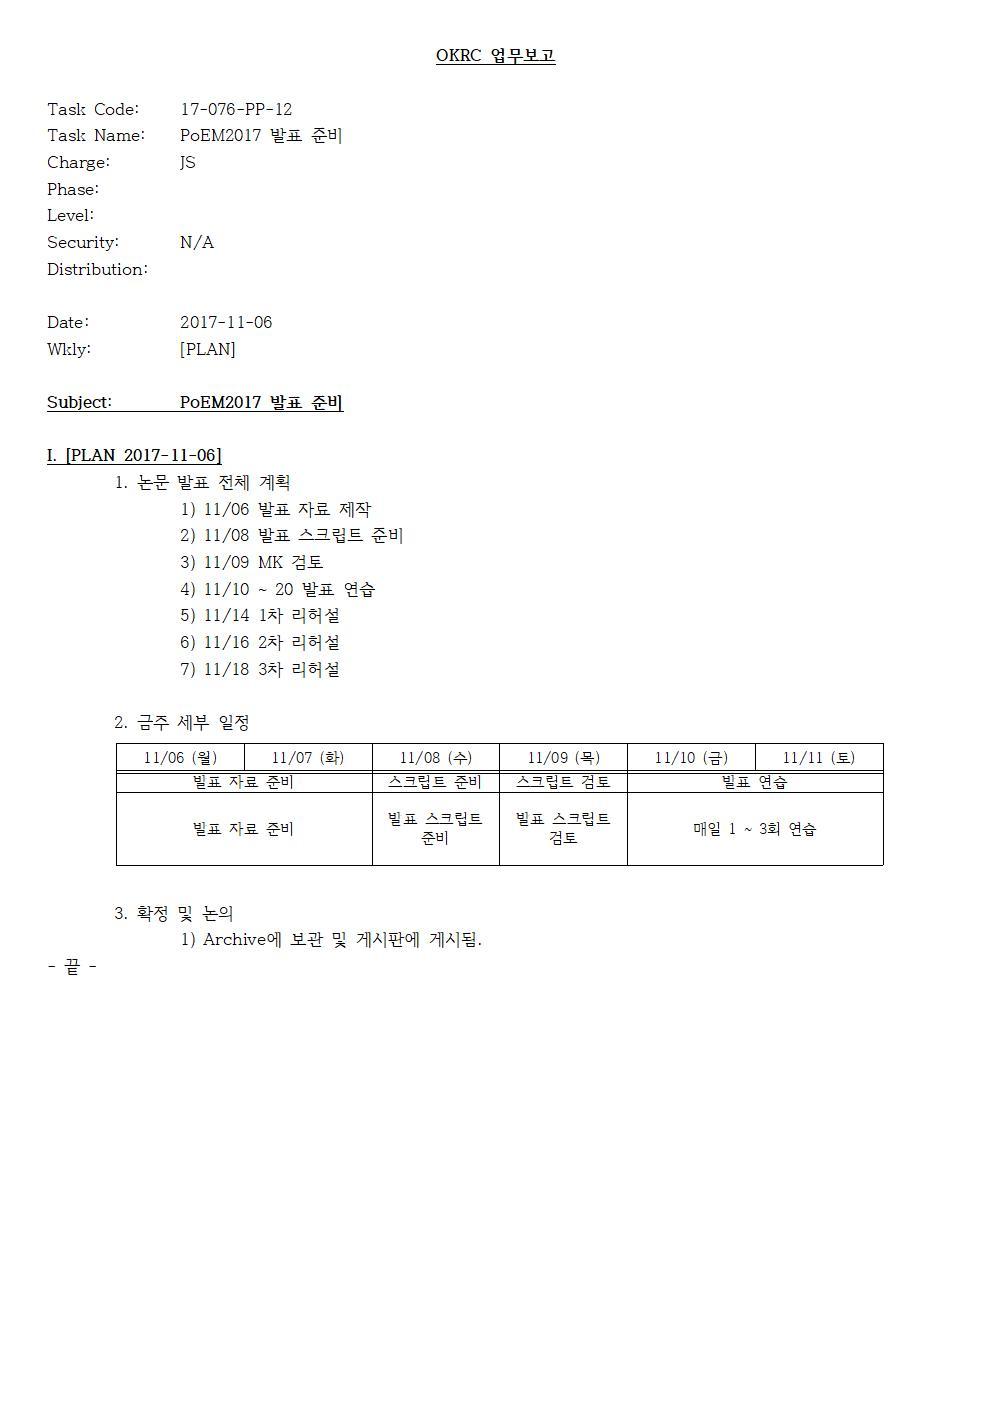 D-[17-076-PP-12]-[PoEM2017-P]-[JS]-[2017-11-06]-[PLAN]001.jpg